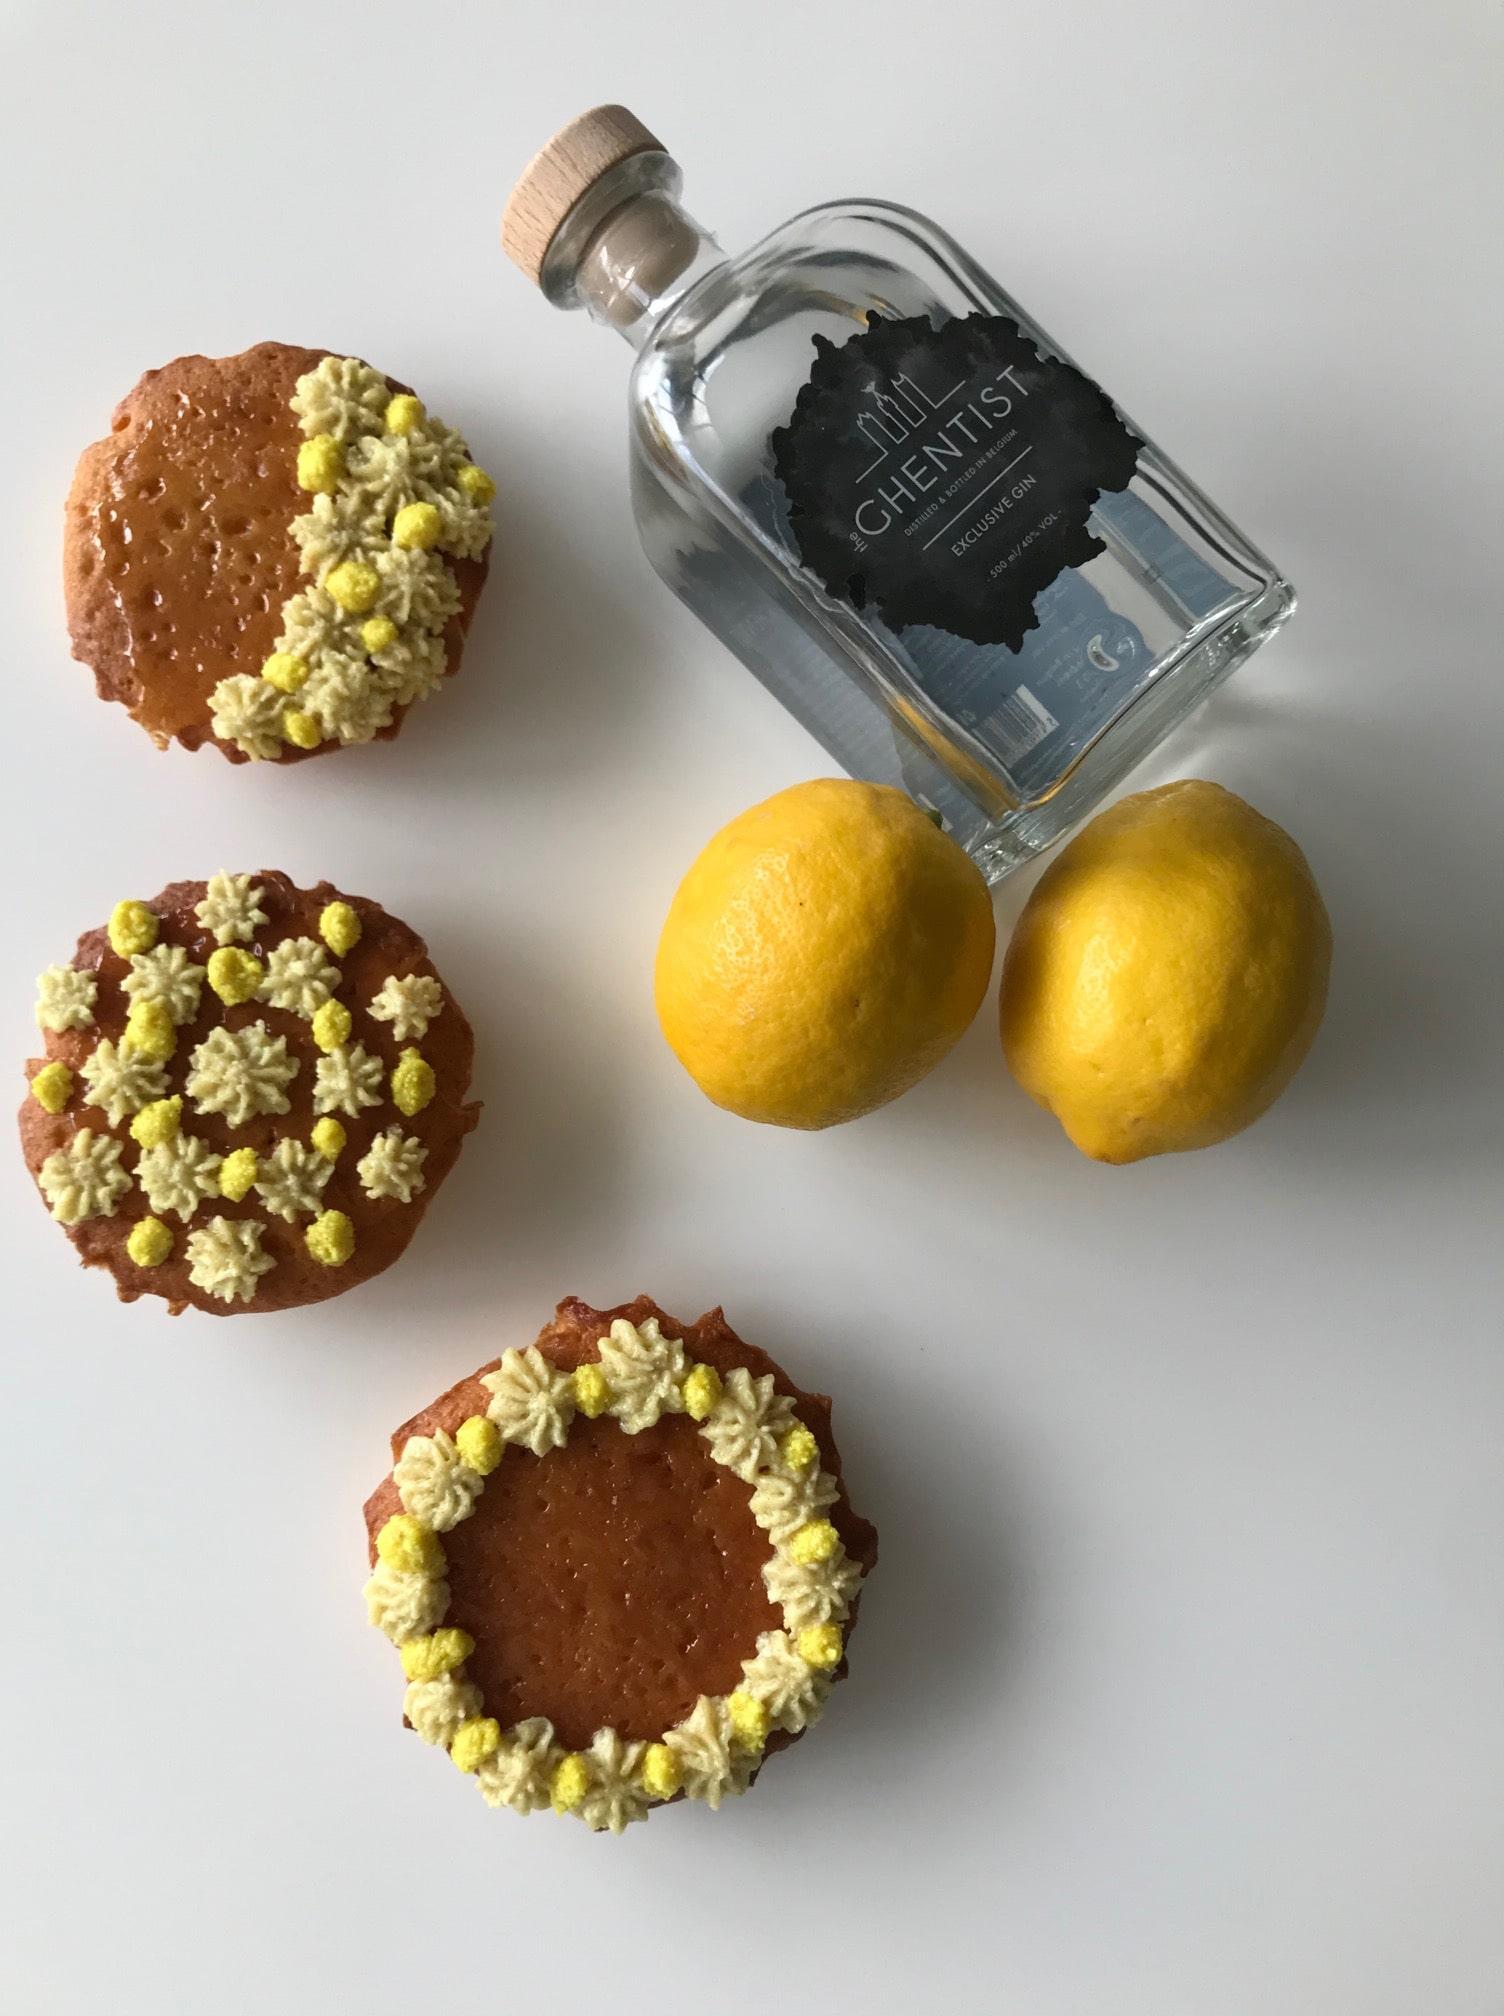 Gin-toniccake met citrussmaak